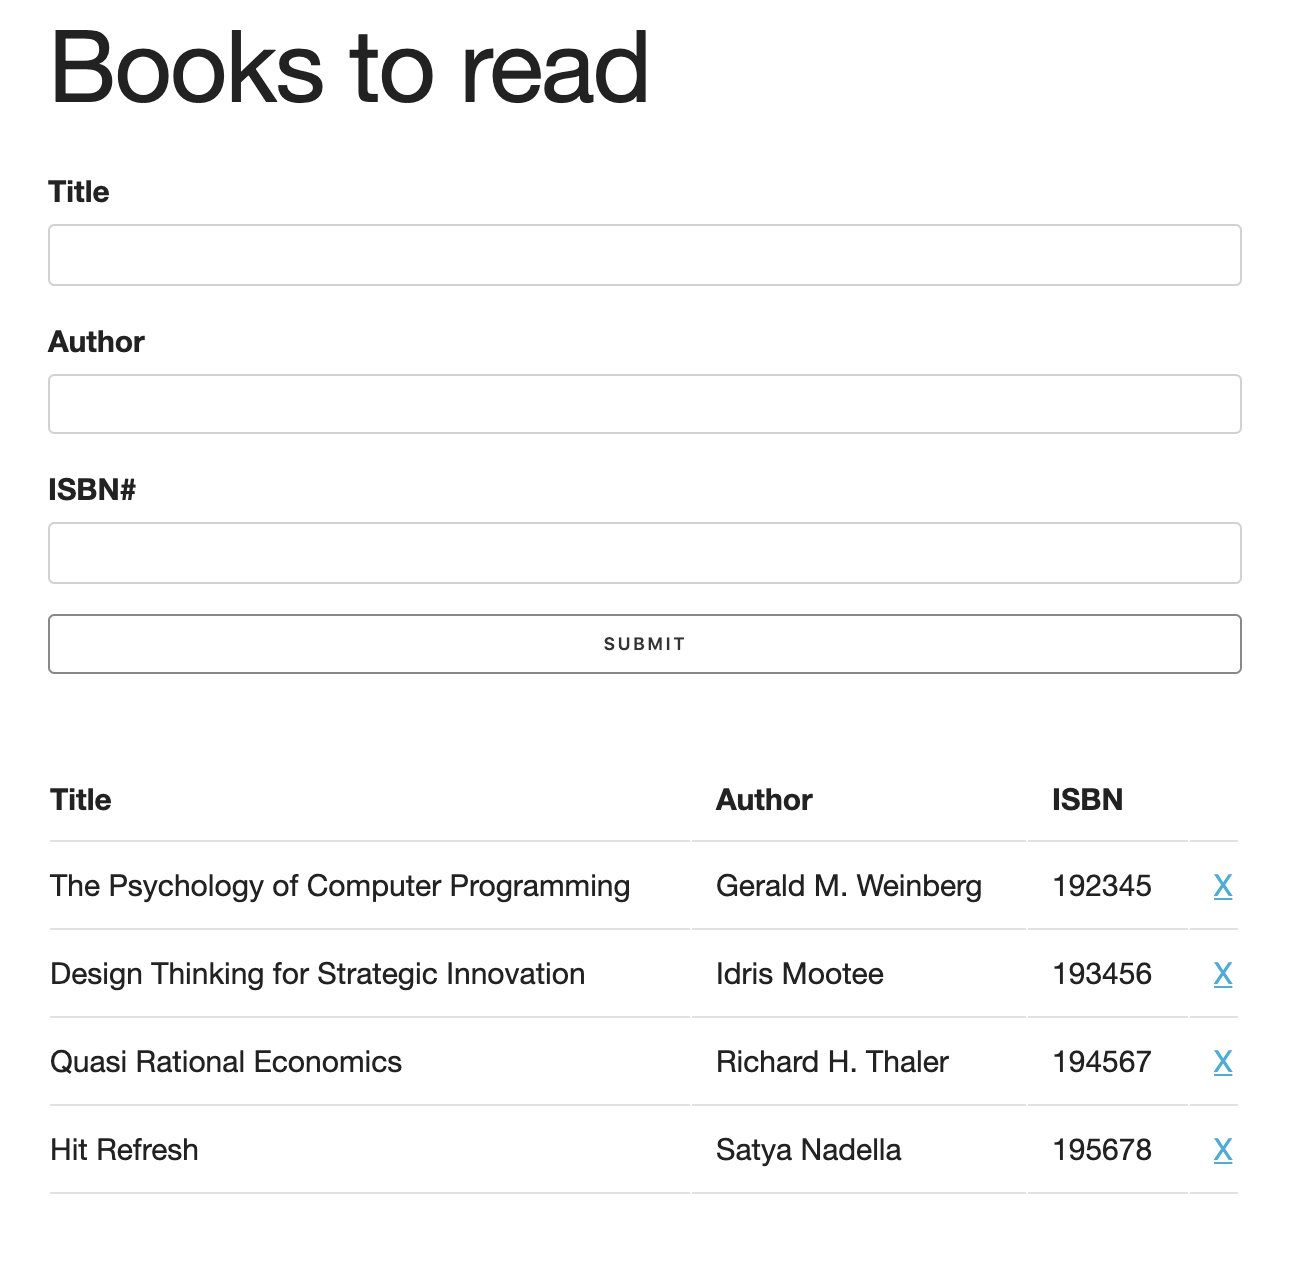 app-booklist.png